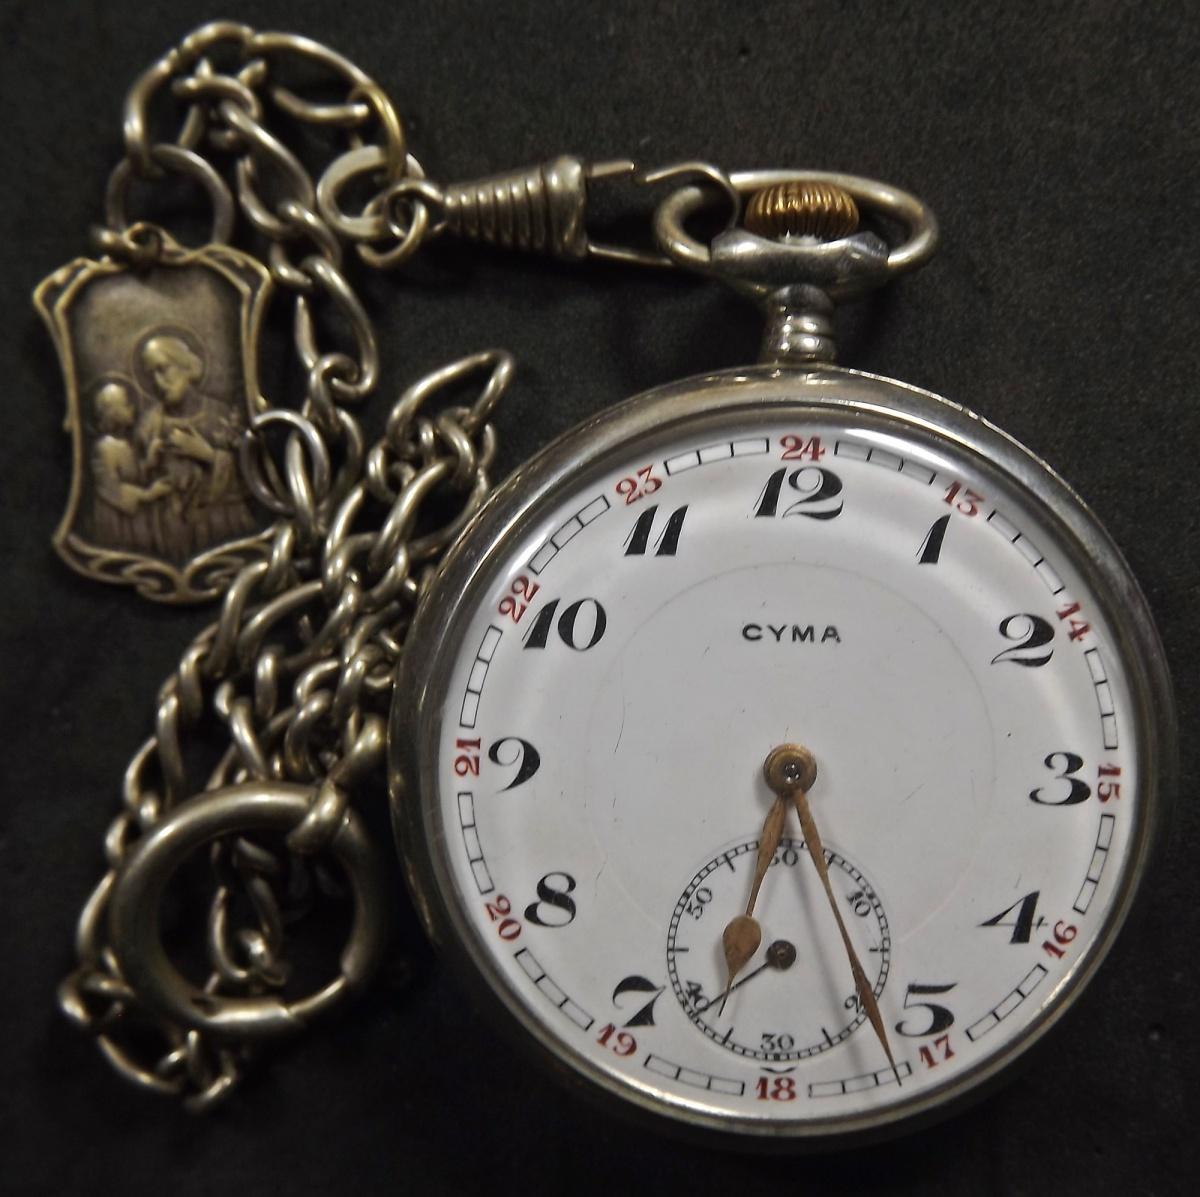 a7baed32eb1 Relógio de bolso Cyma